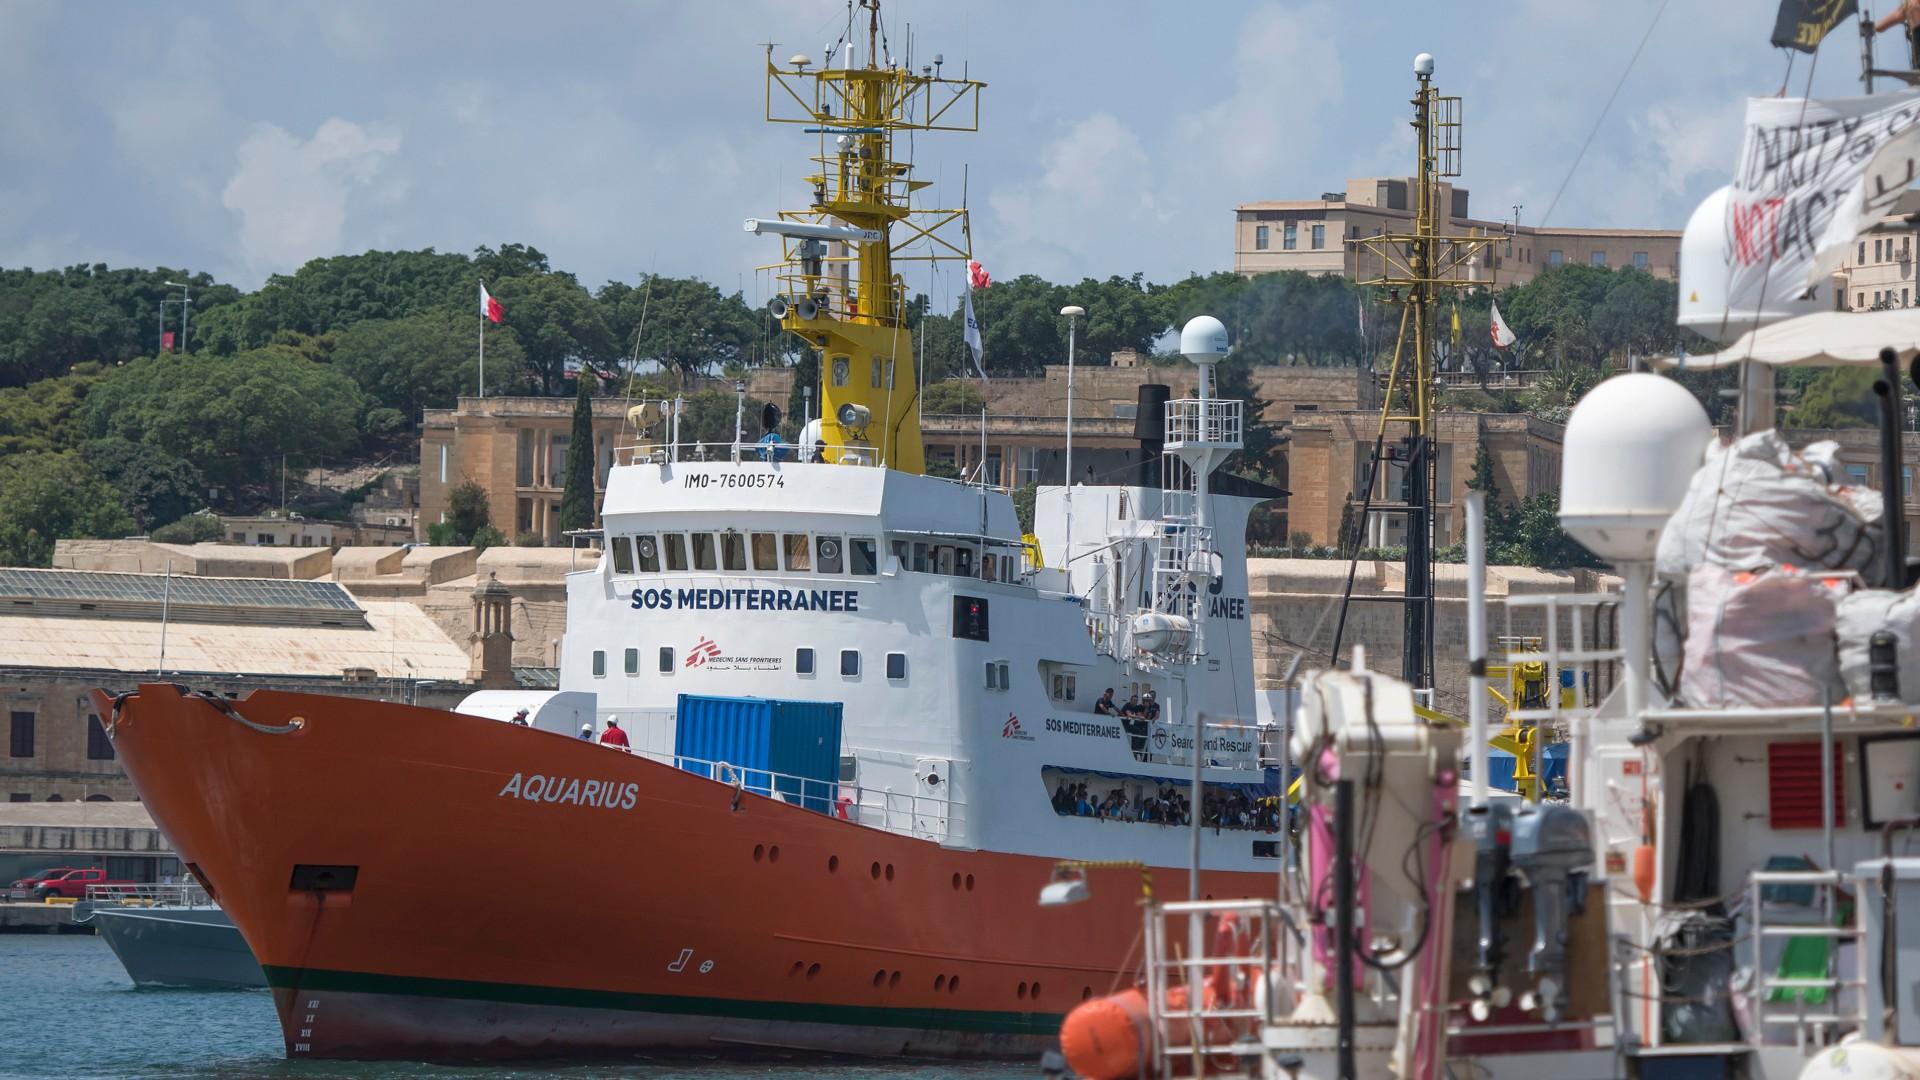 NGO ship Aquarius docked